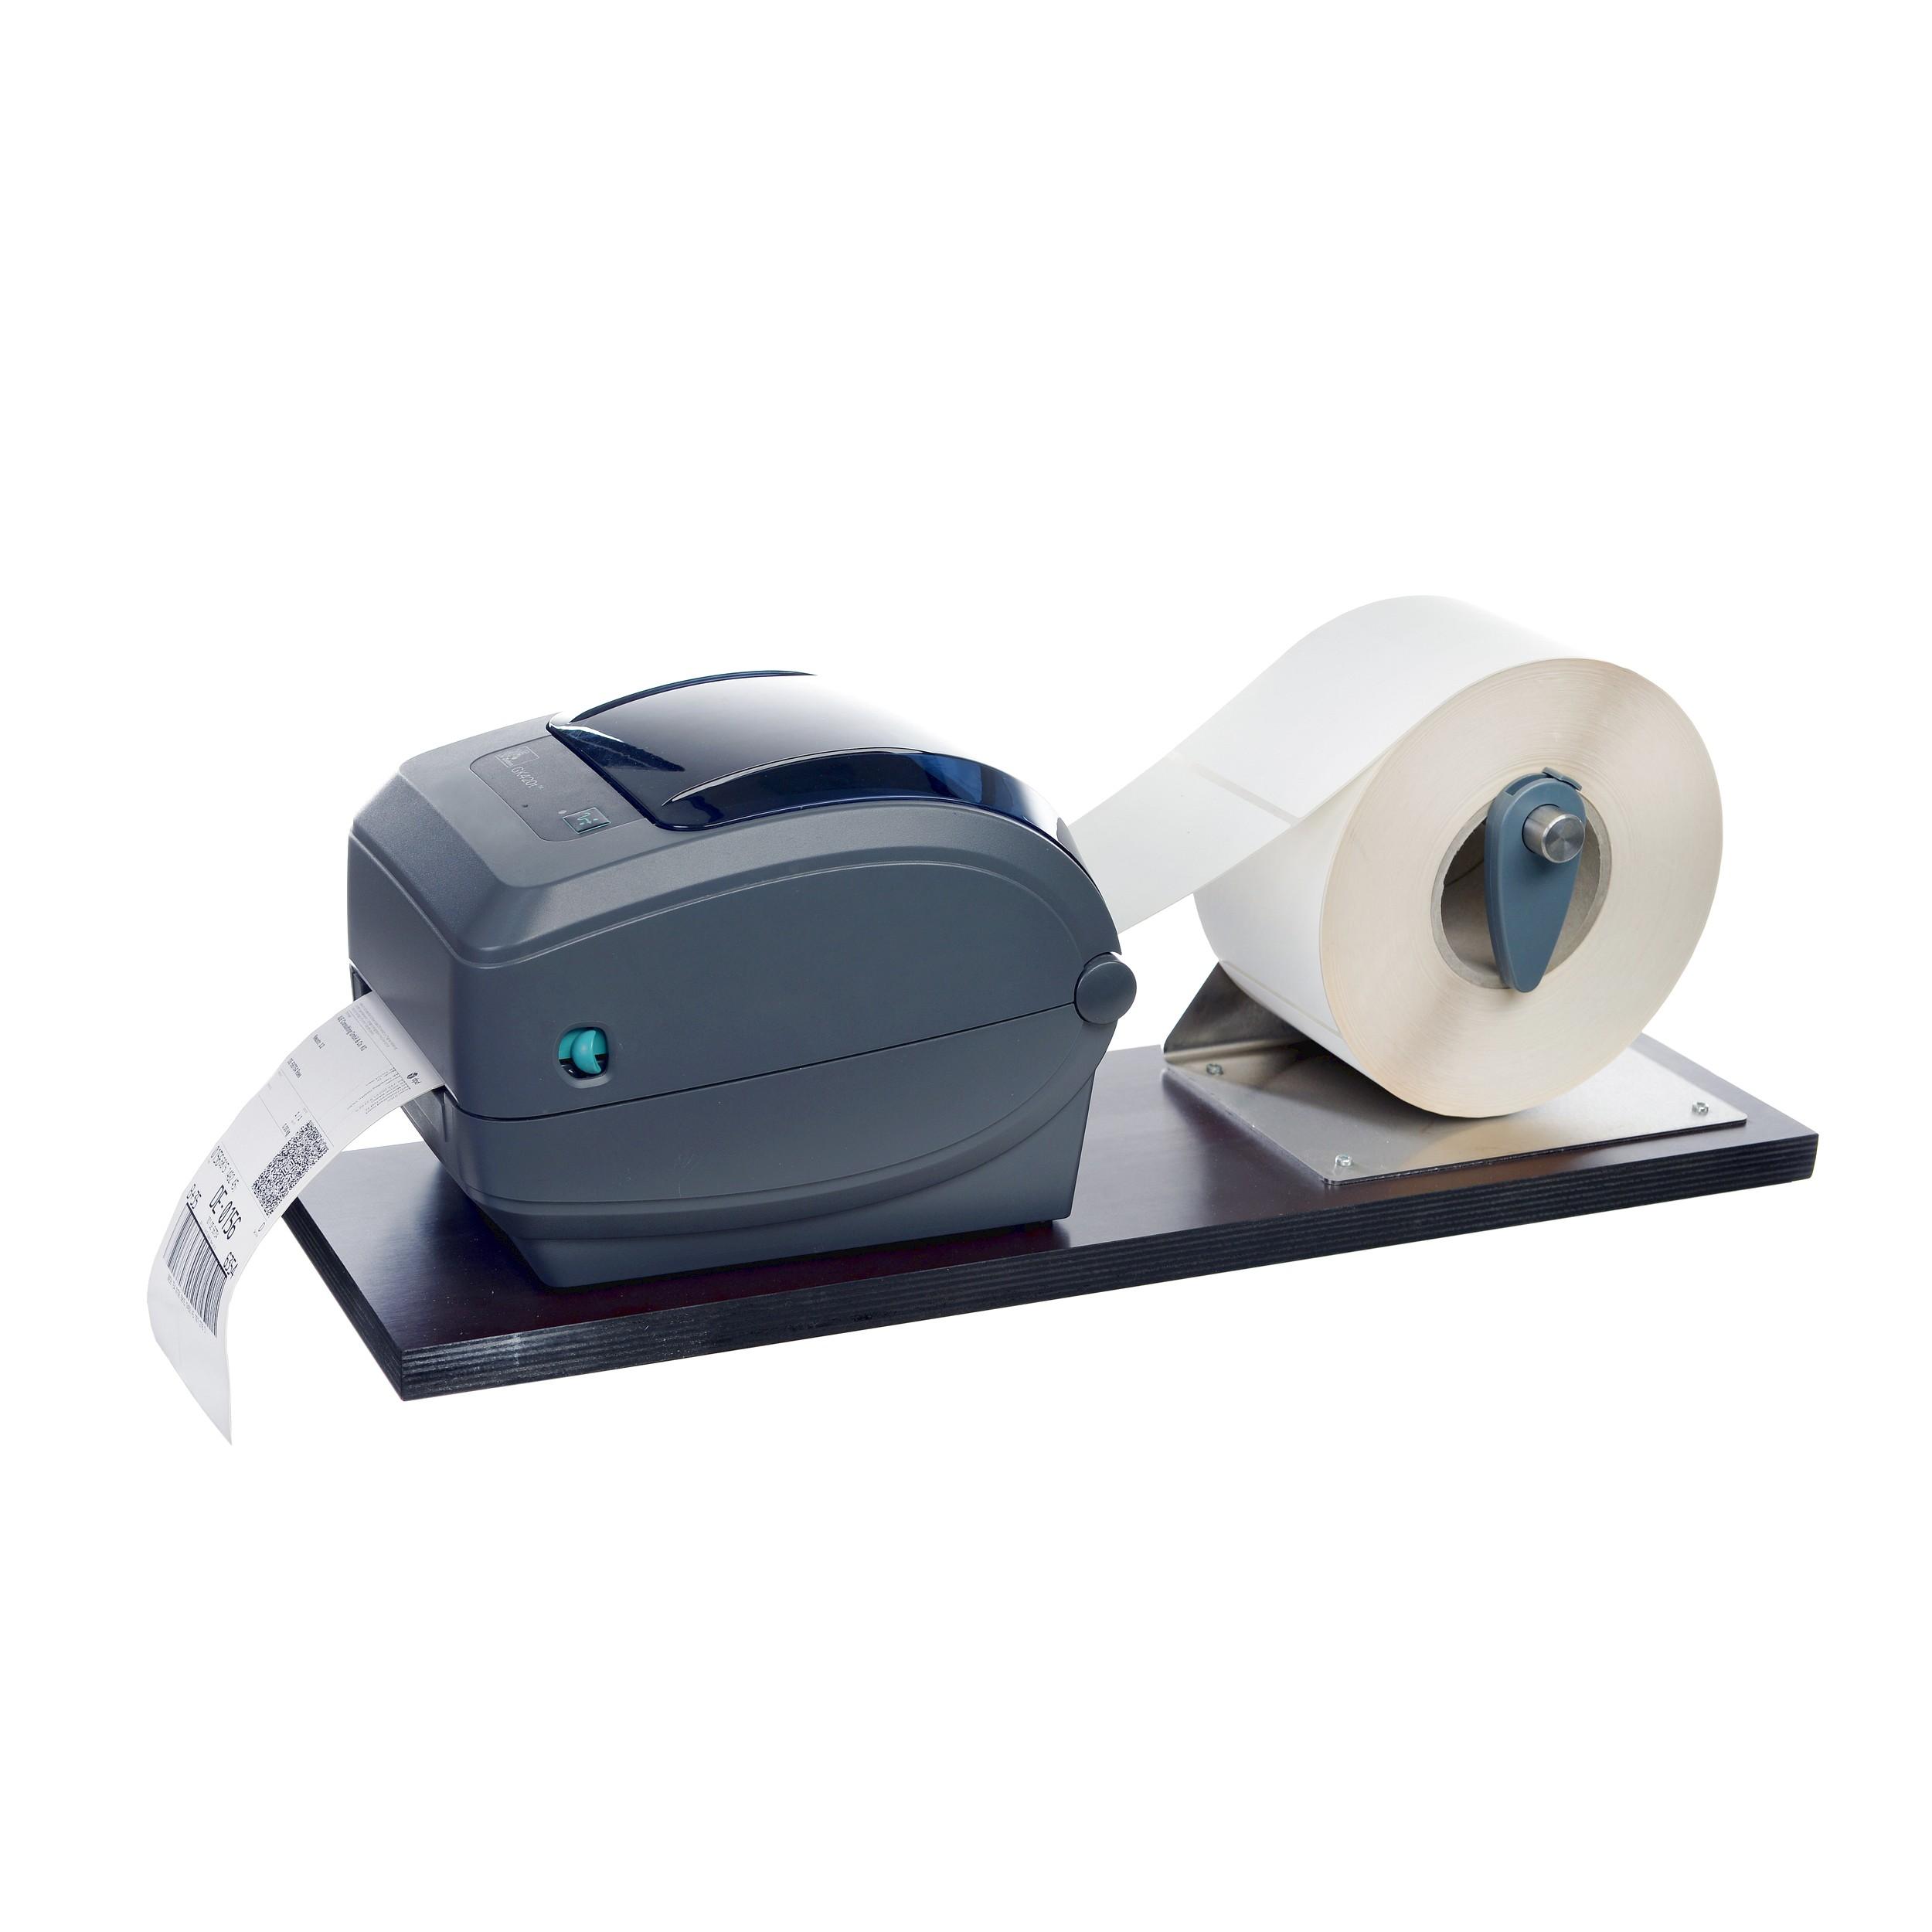 Etikettendrucker Etiketten Drucken Rolle Versandetiketten Rollenhalterung Halterung Versand Logistik Hardware 5